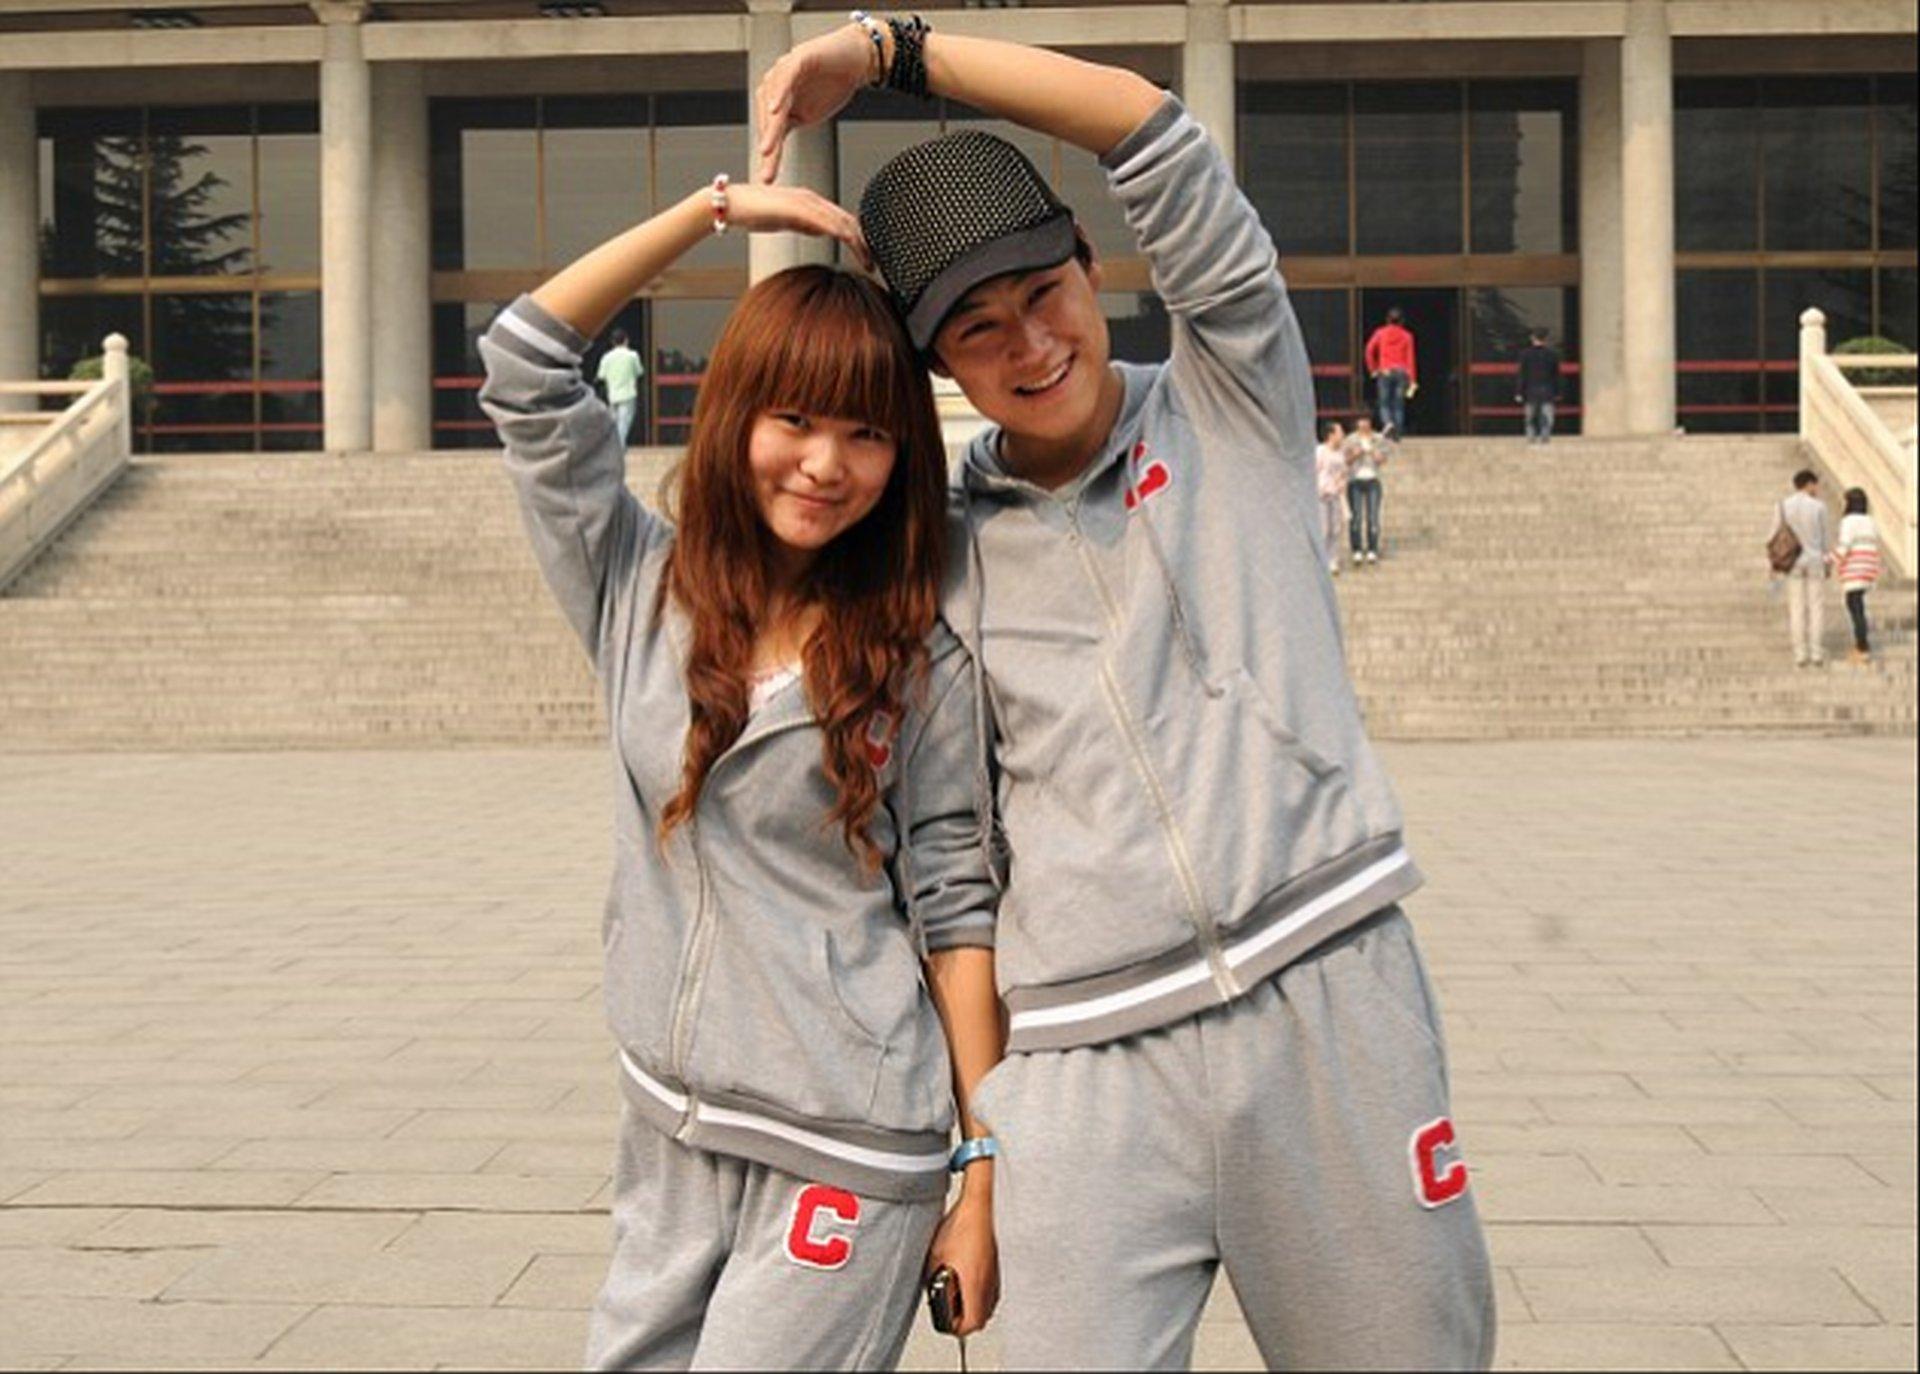 stupid_couple1